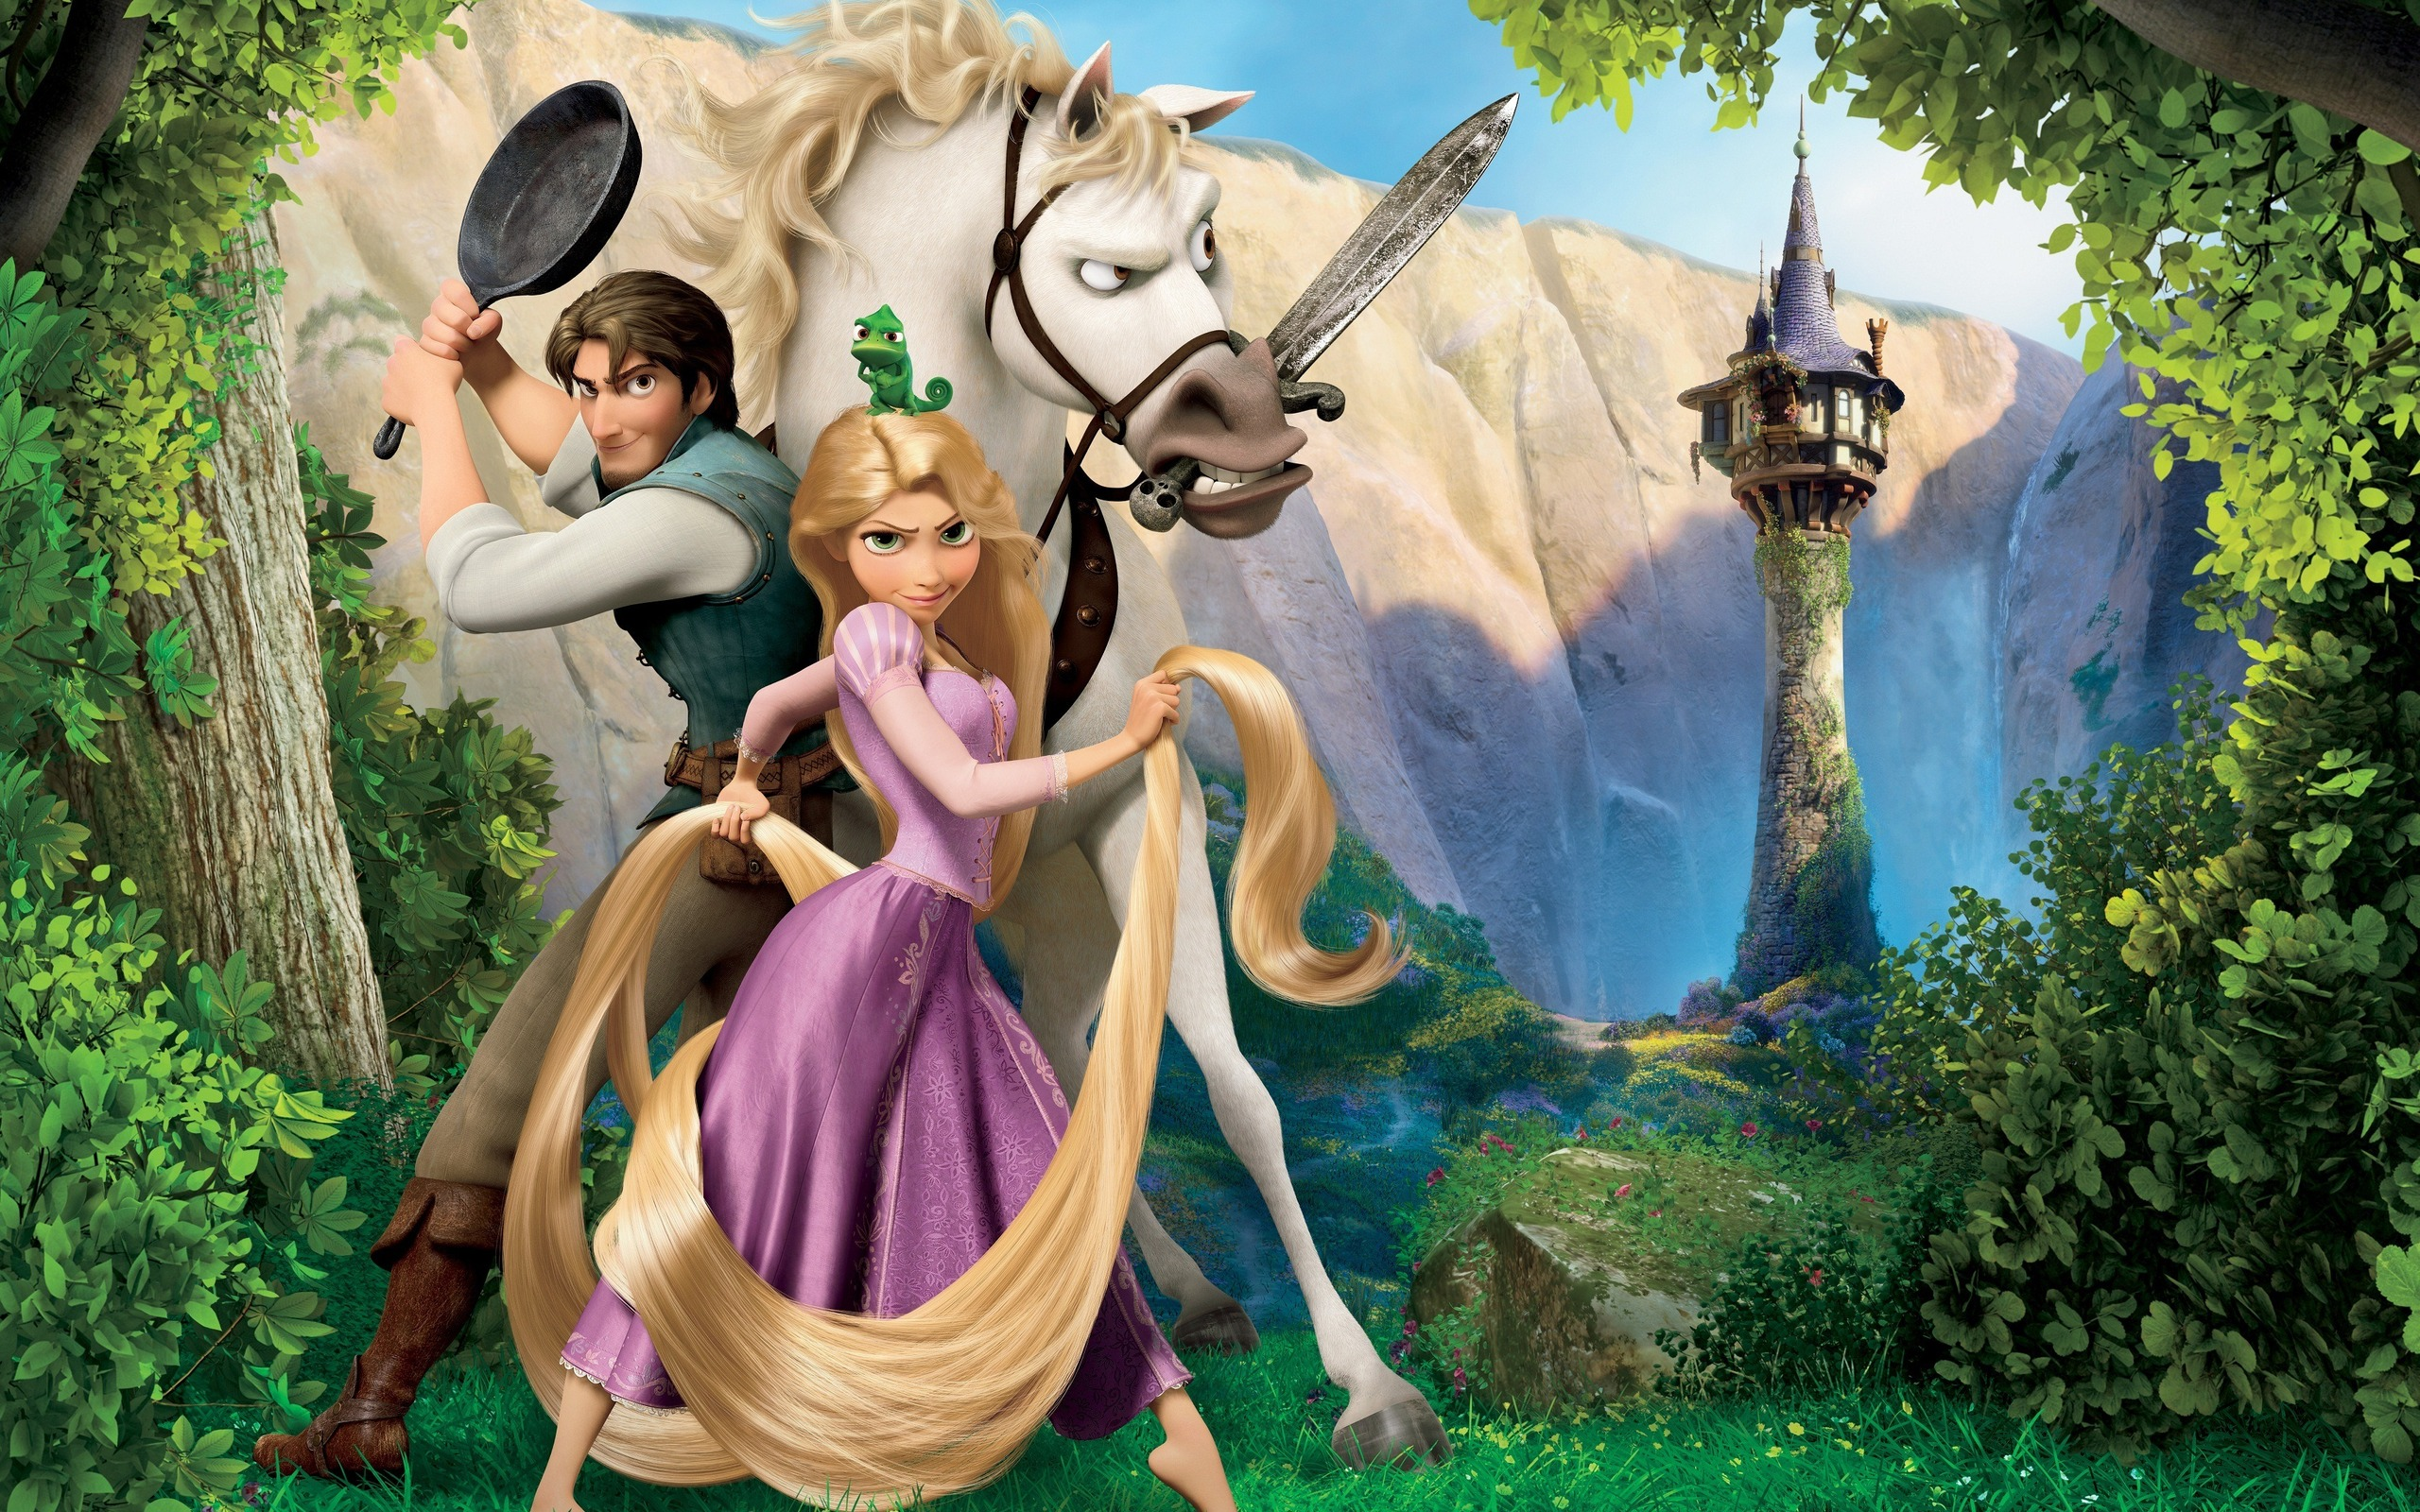 78+ images about disney on Pinterest | Disney, Walt disney